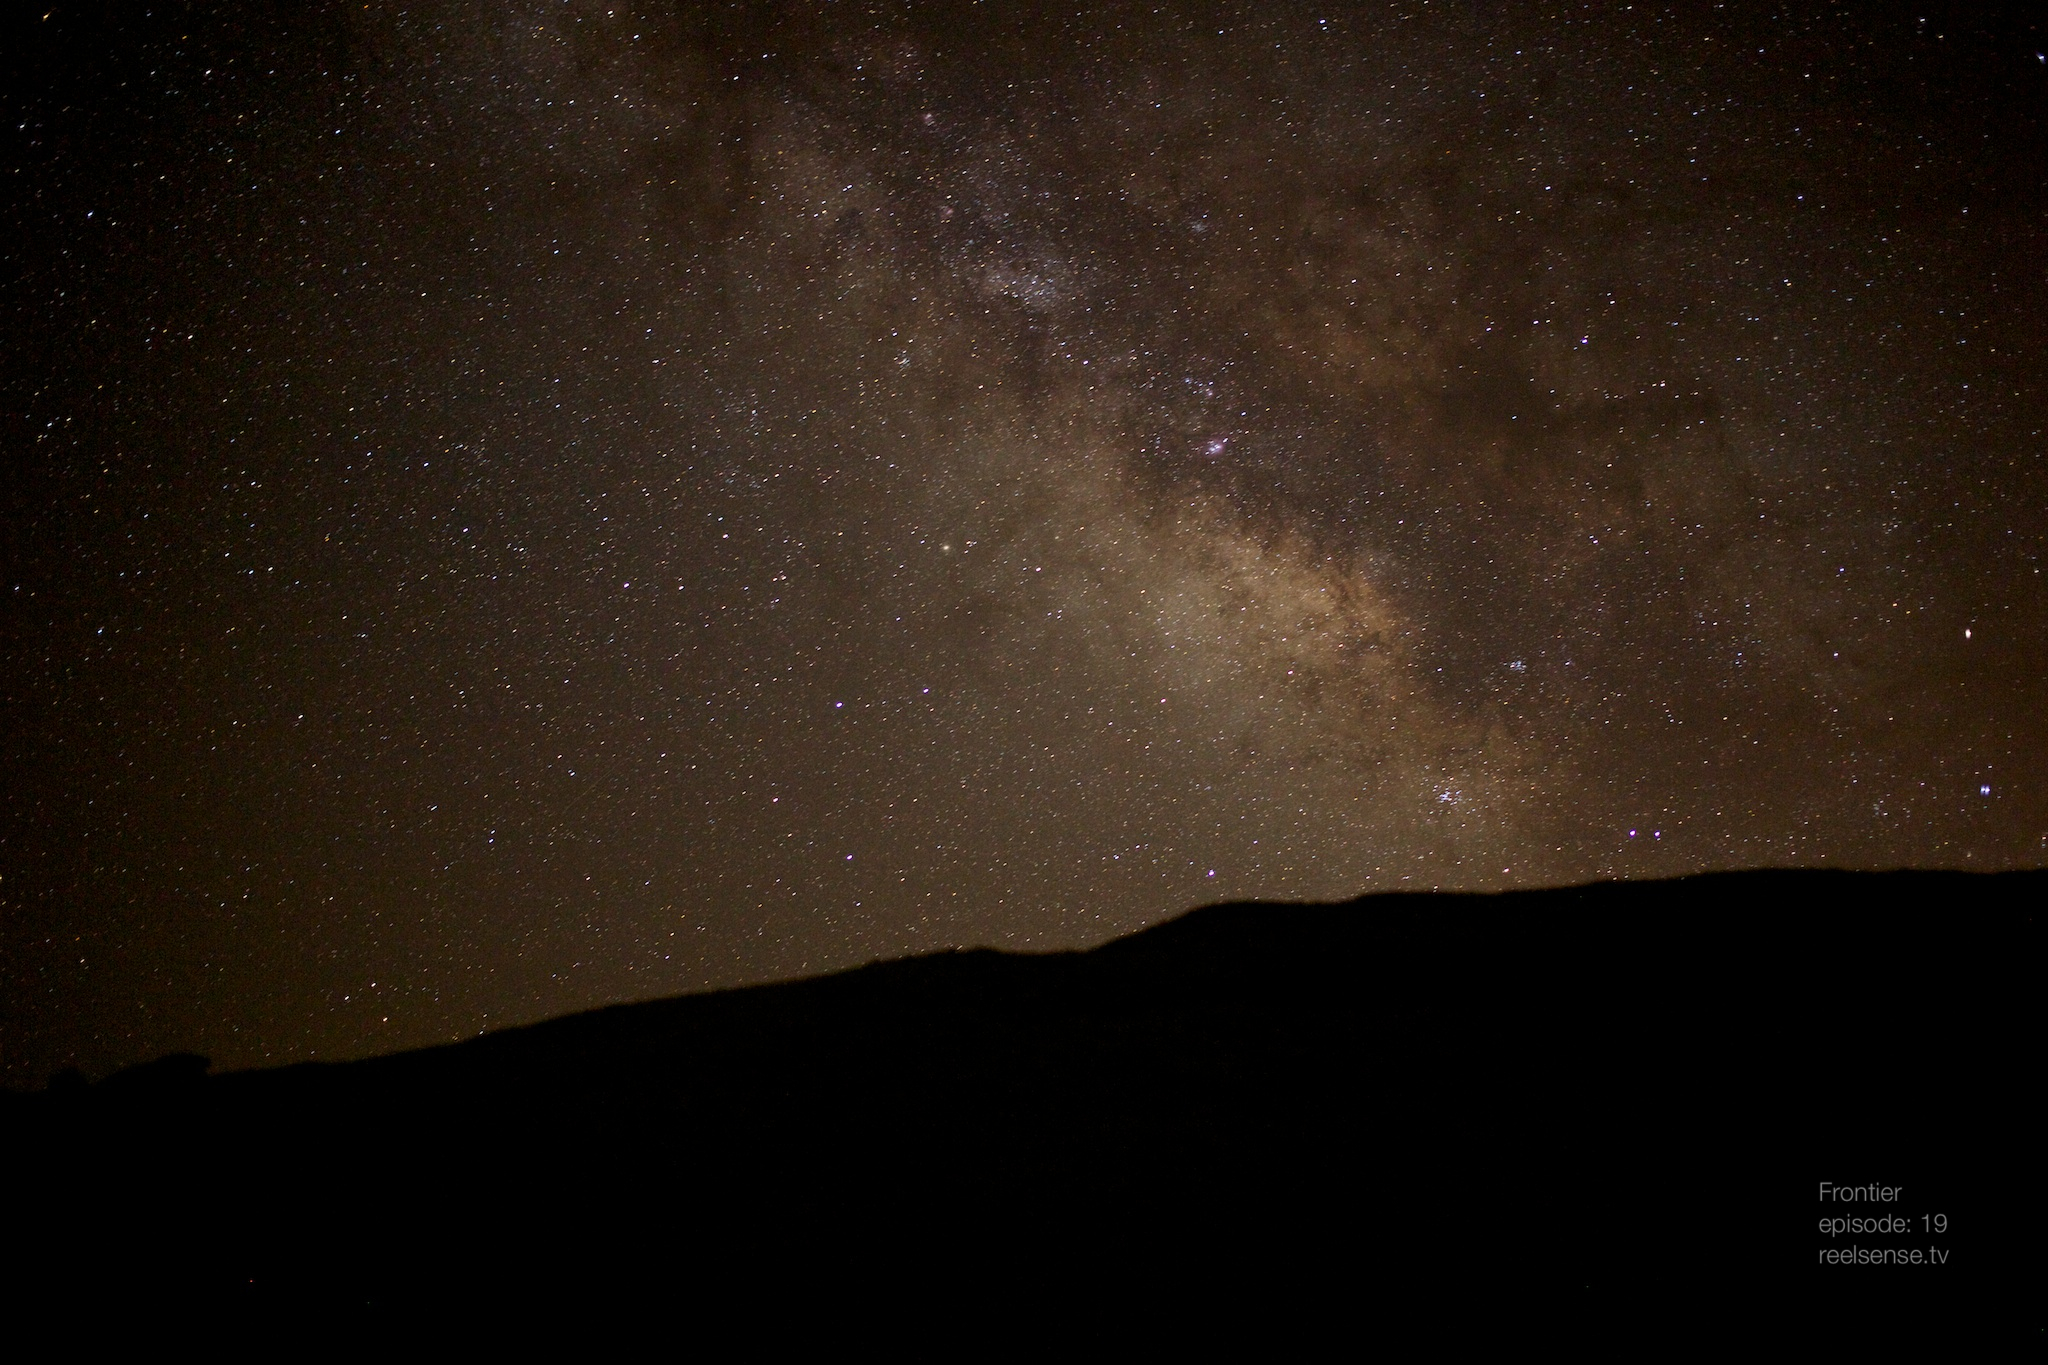 Joshua Tree - Milky Way galaxy